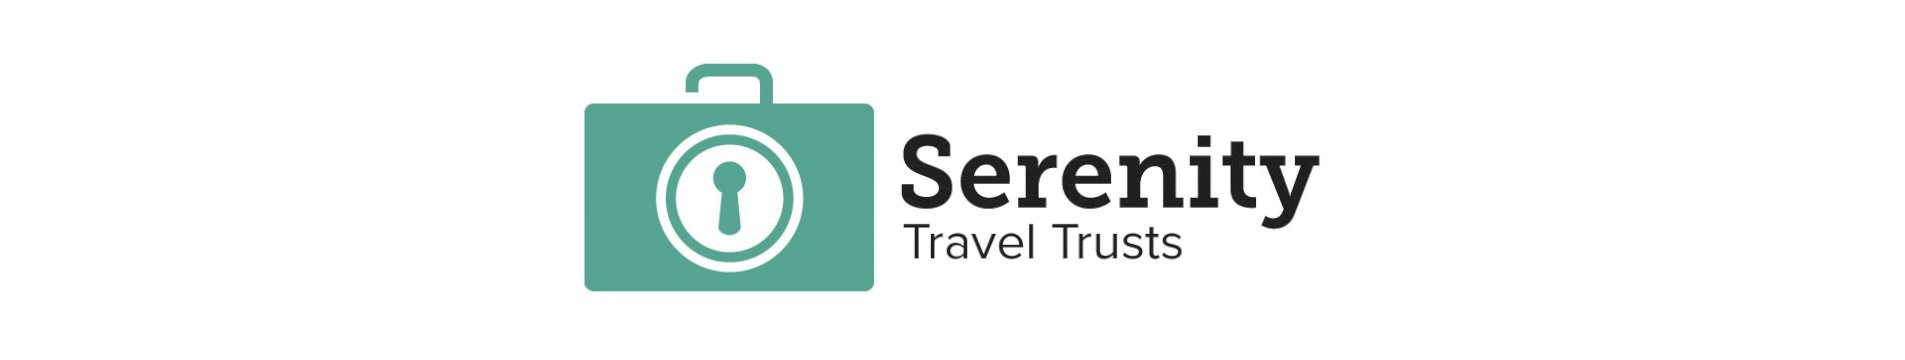 Serenity Travel Trust